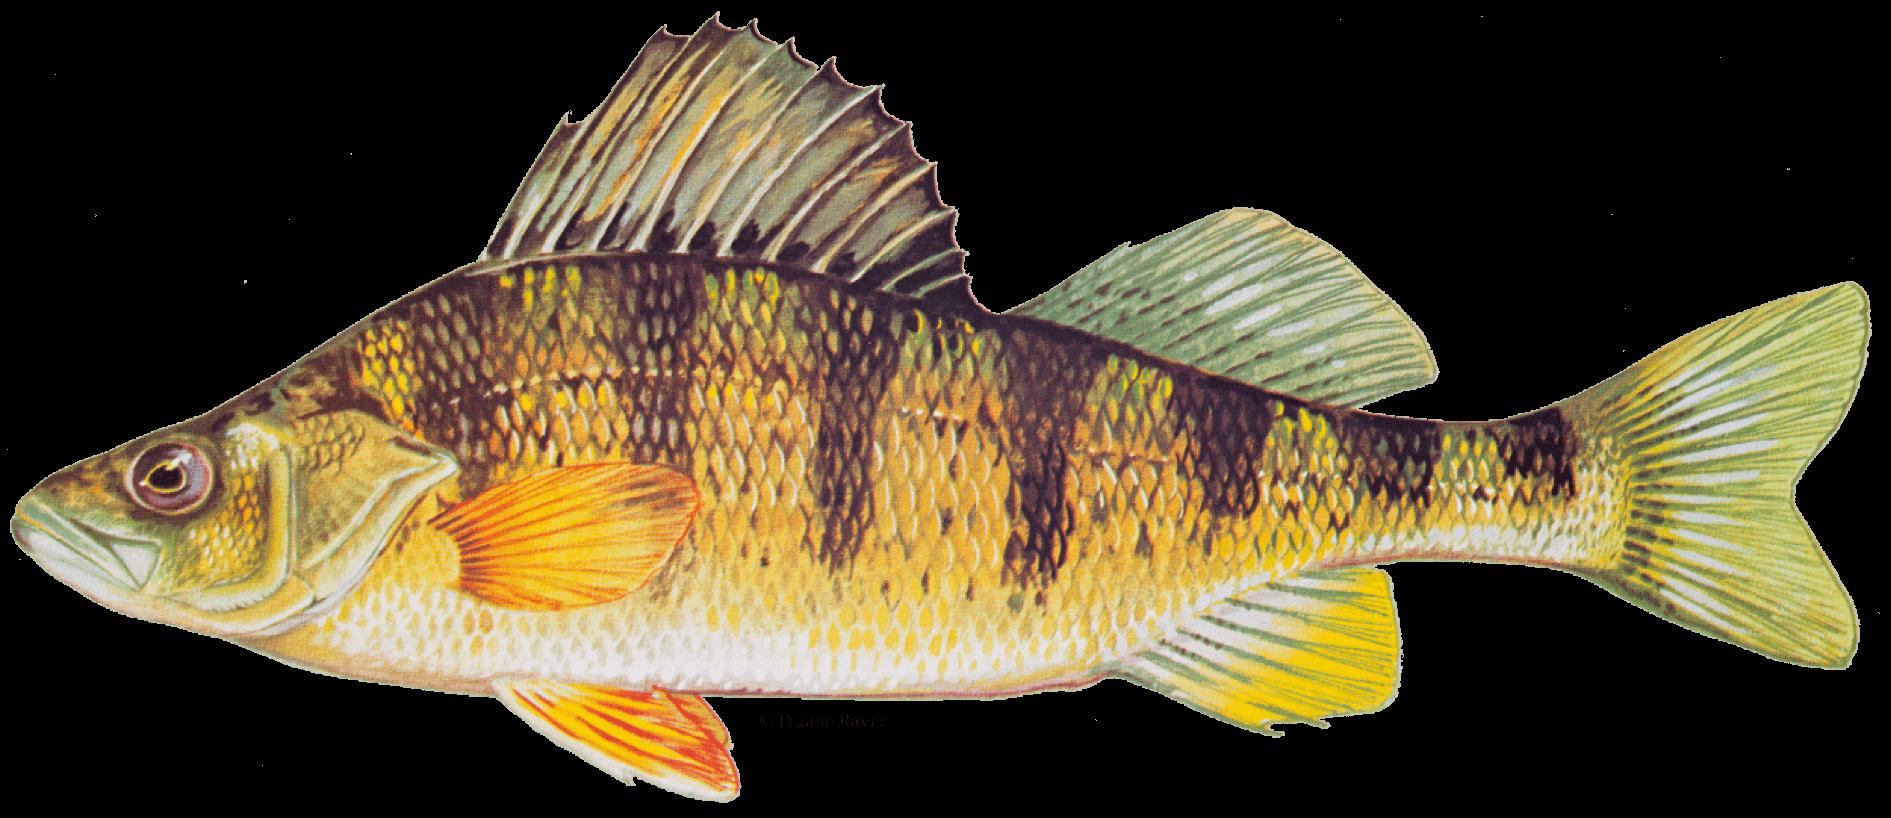 Fishing-Guide-How-to-Catch-Yellow-Perch